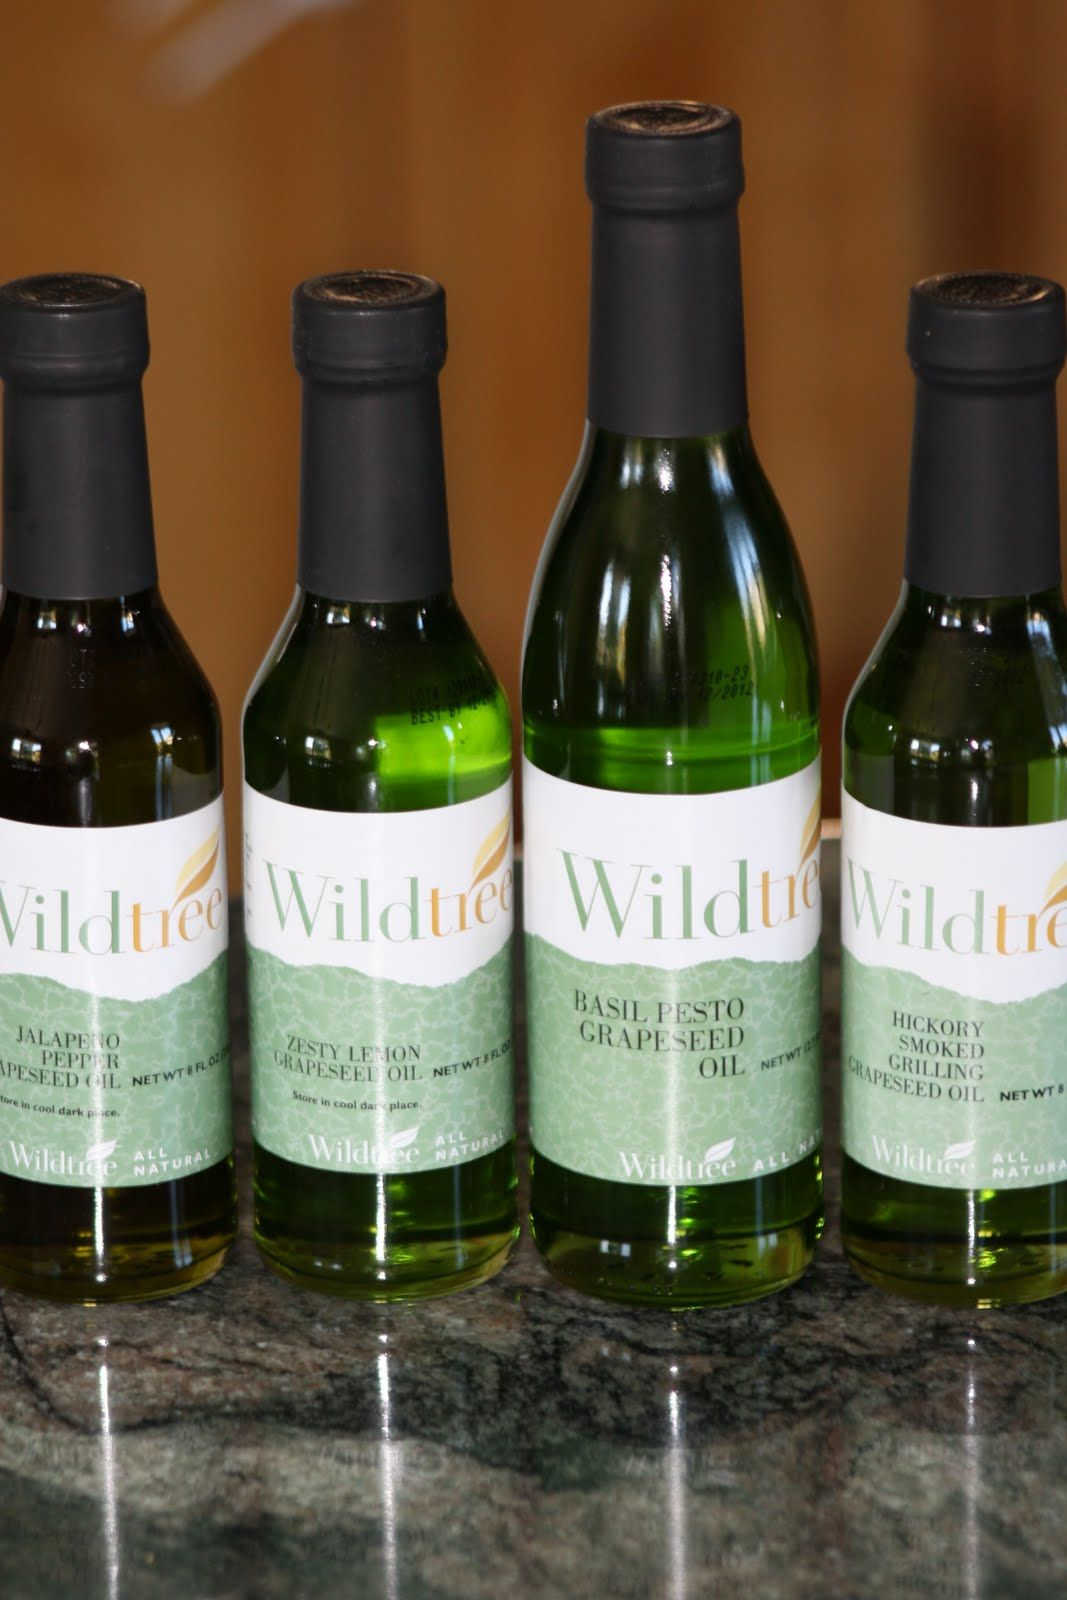 Loving the Wildtree grapeseed oil! Stuffed jalapeno